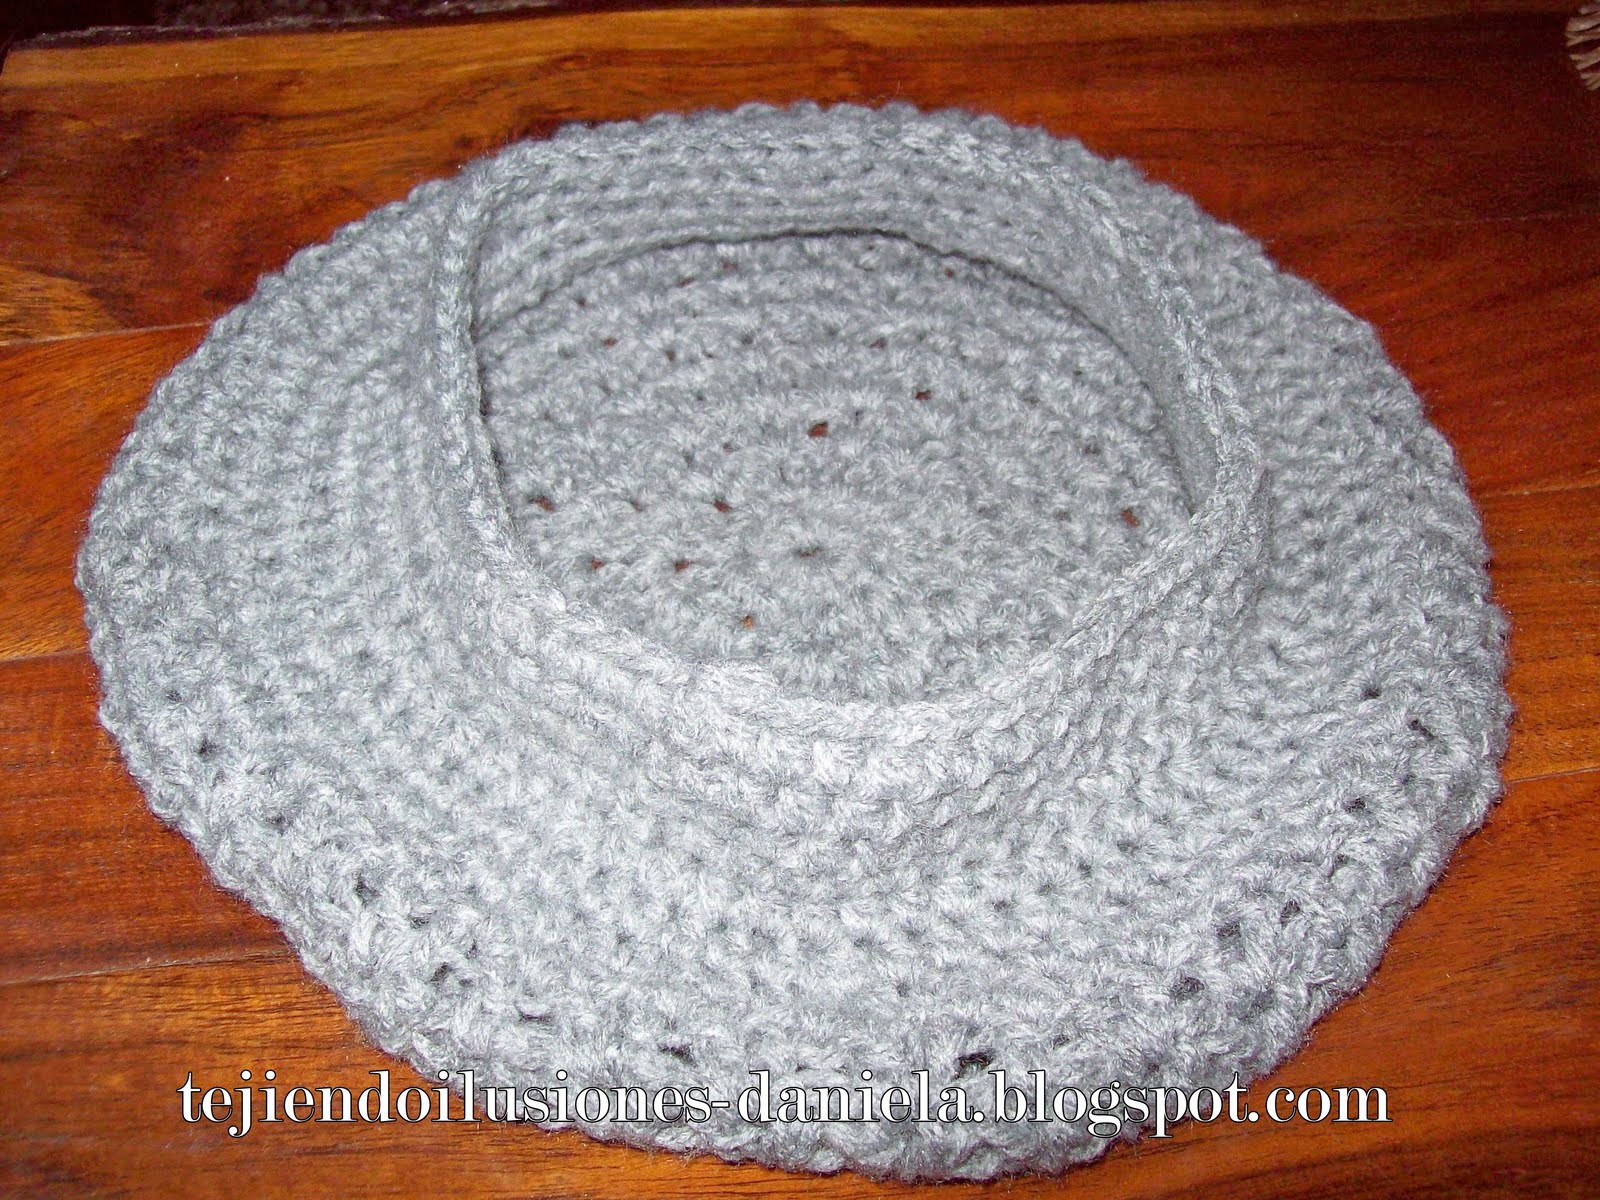 27d793516b79c Boinas Tejidas A Crochet Con Patrones Imagui - OneLetter.CO